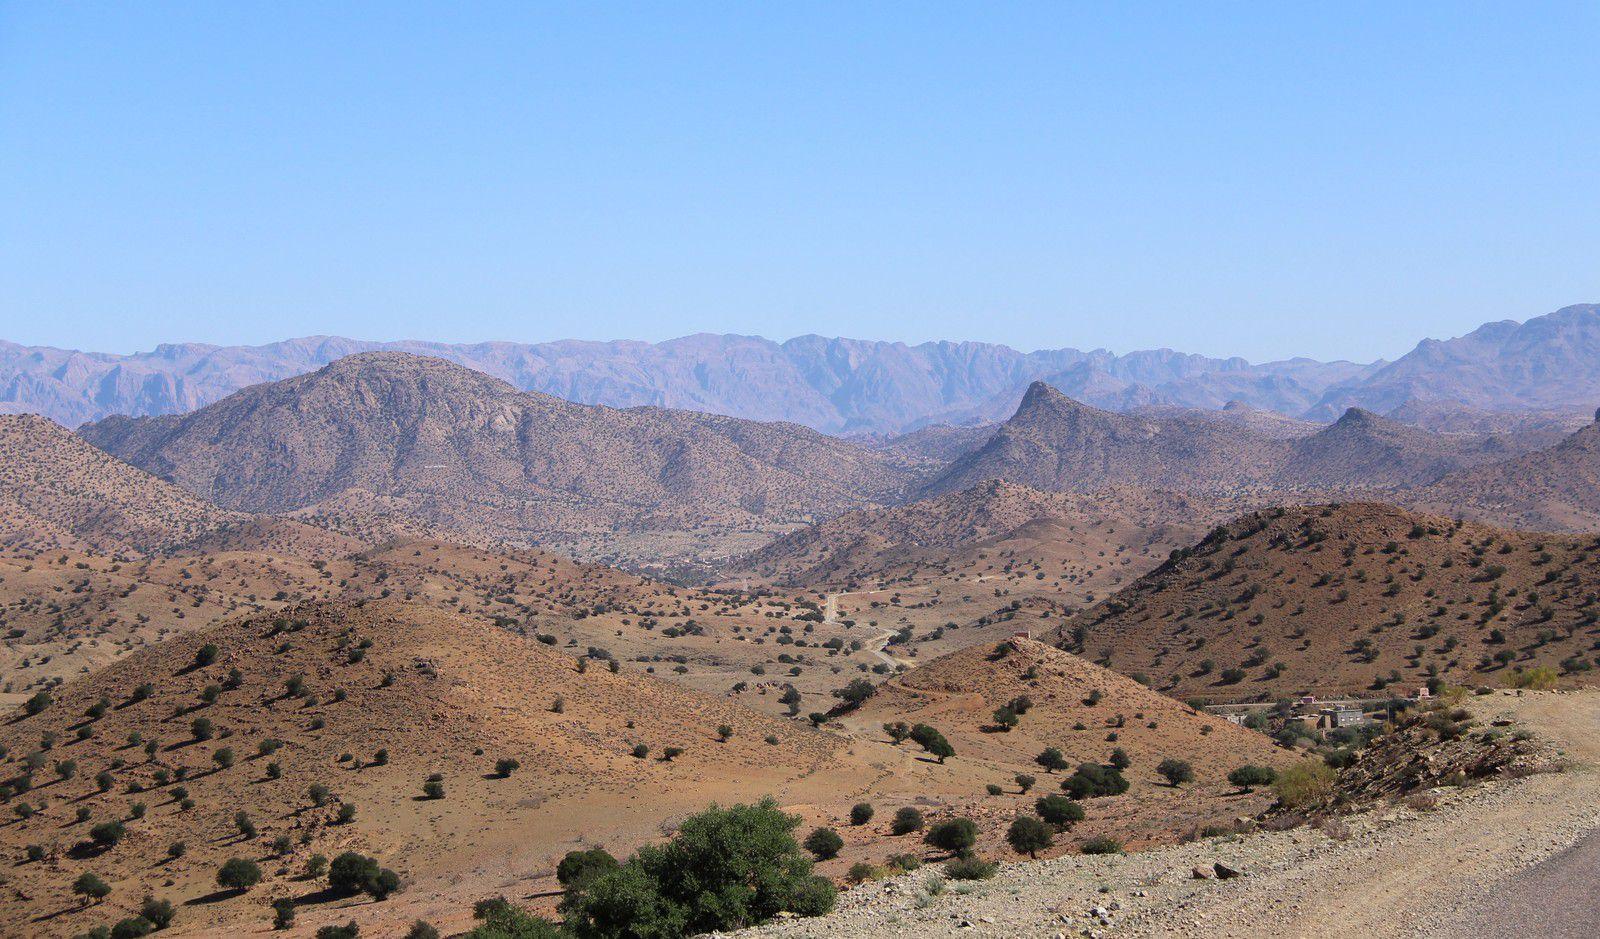 AFRIQUE - ETAPE 2 - MAROC SUD - PART II